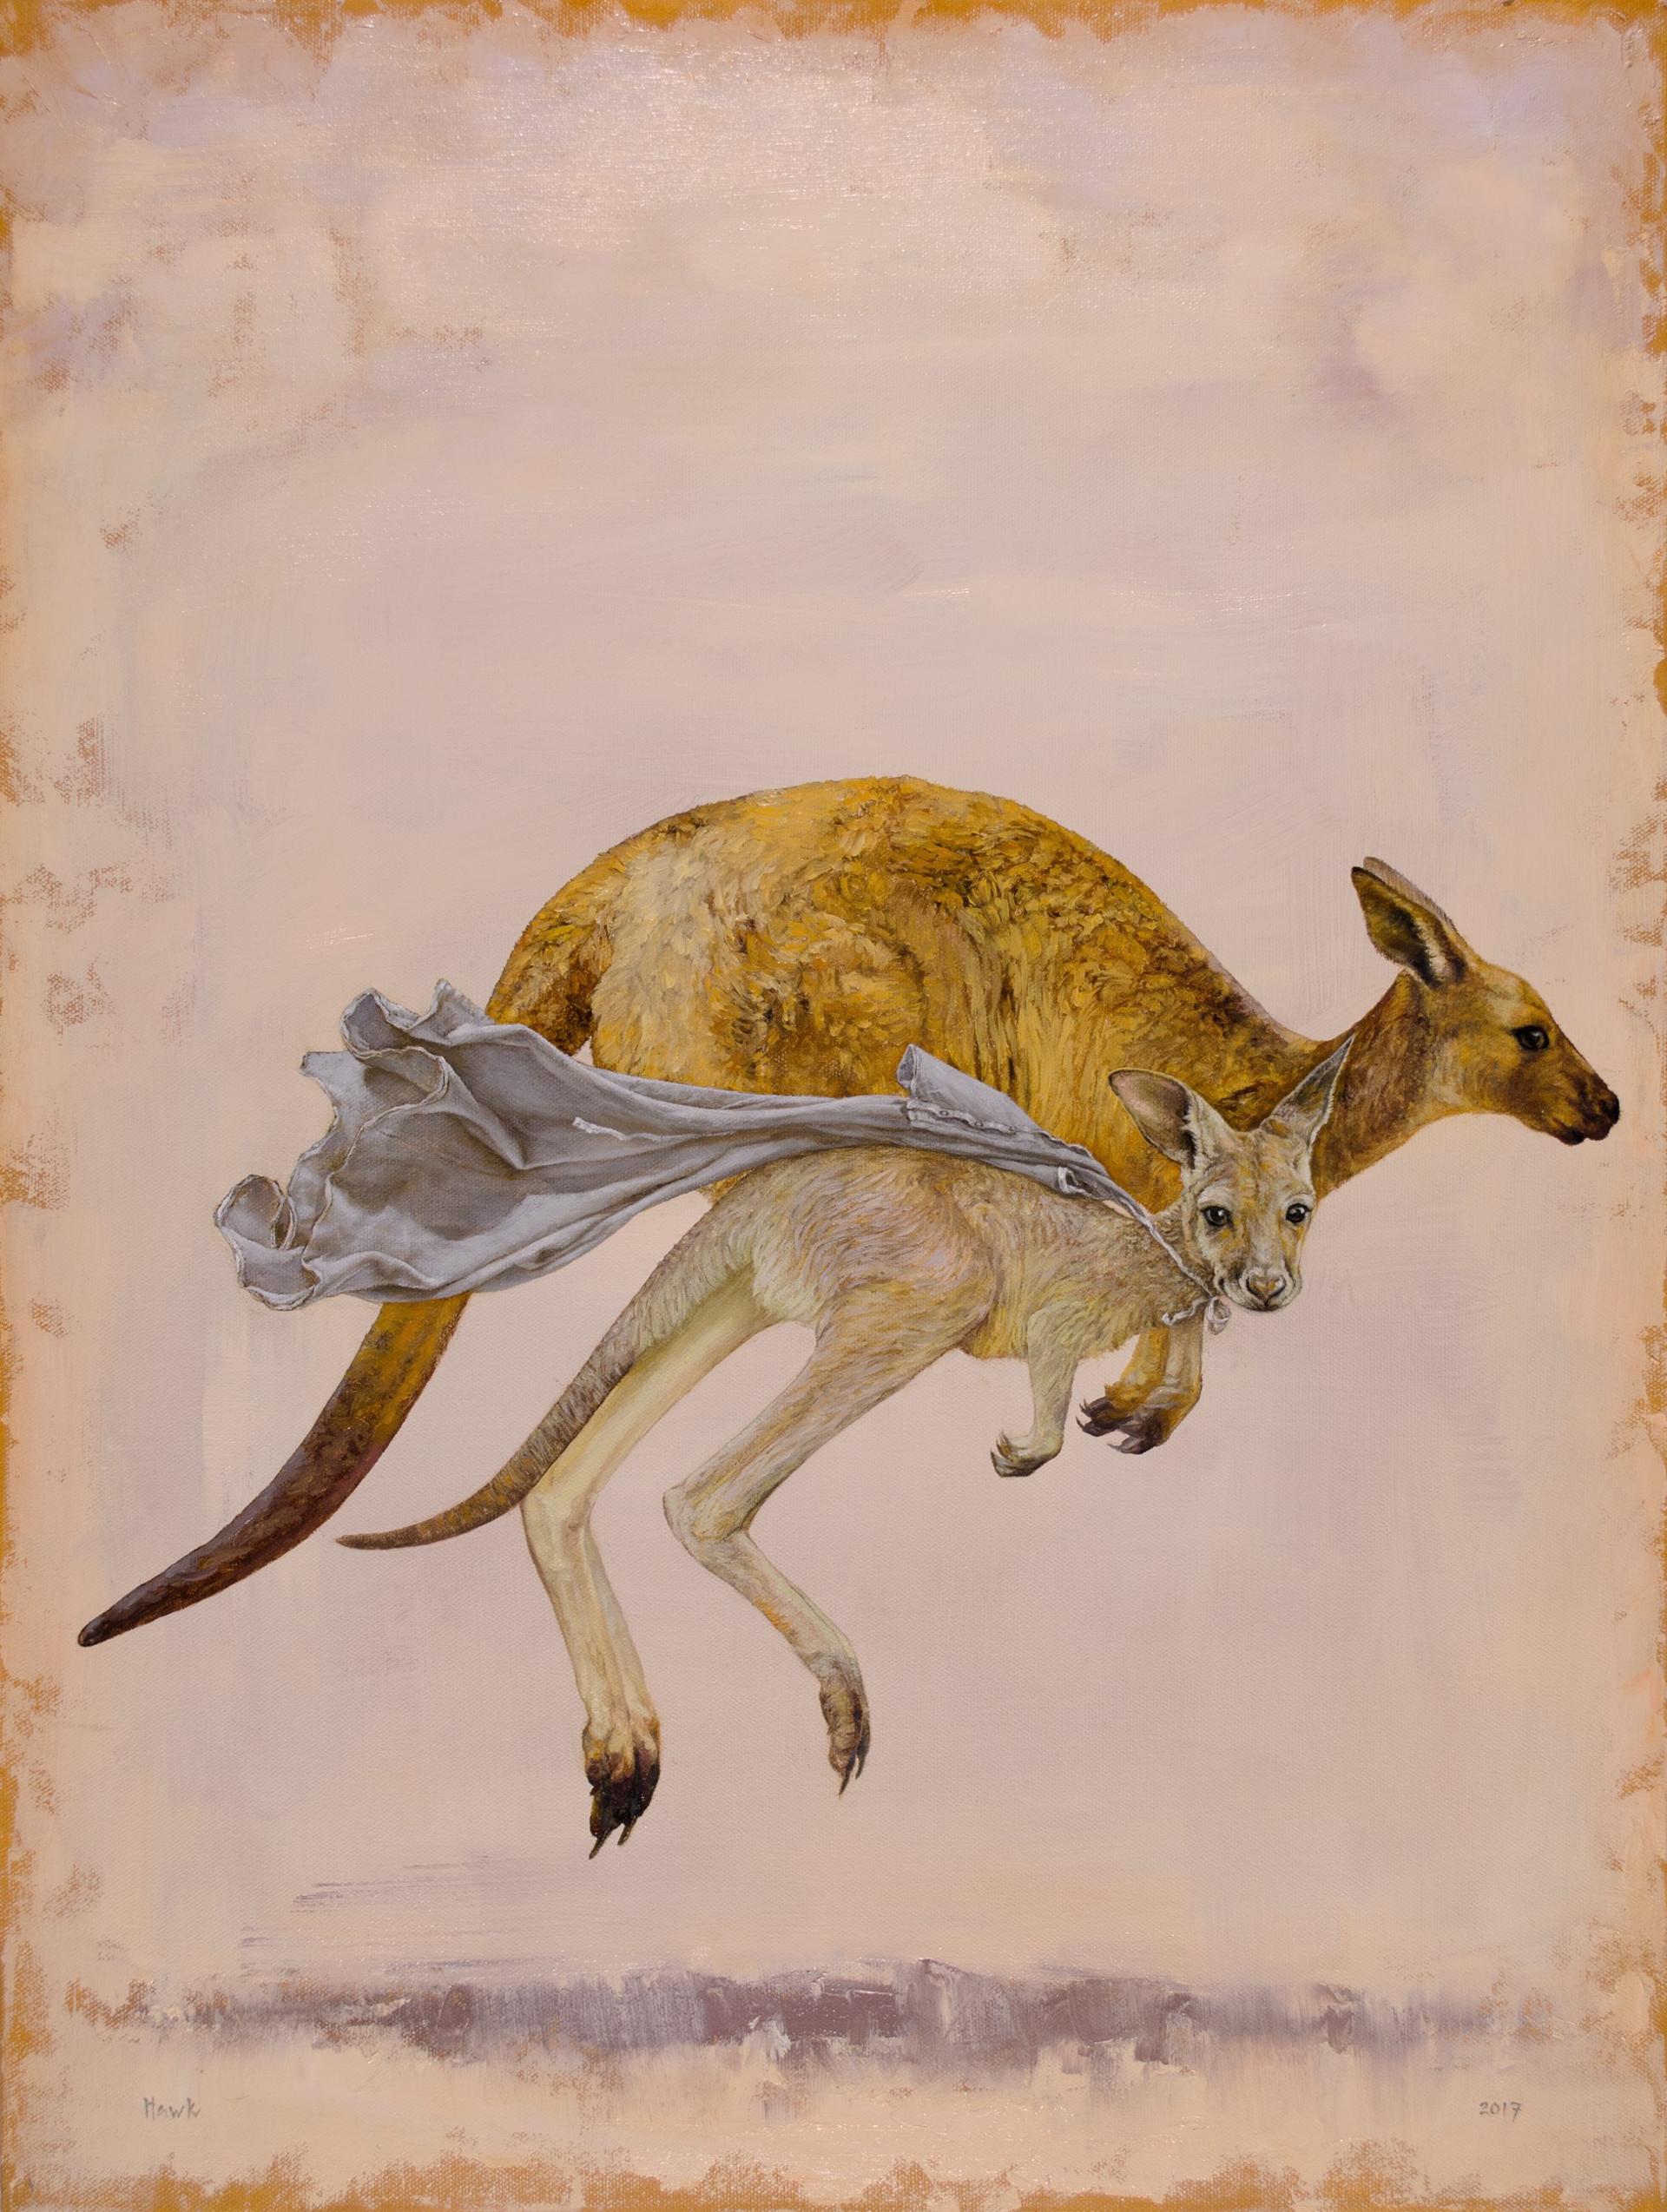 The Children's Hospital Kangaroo commission by Dana Hawk